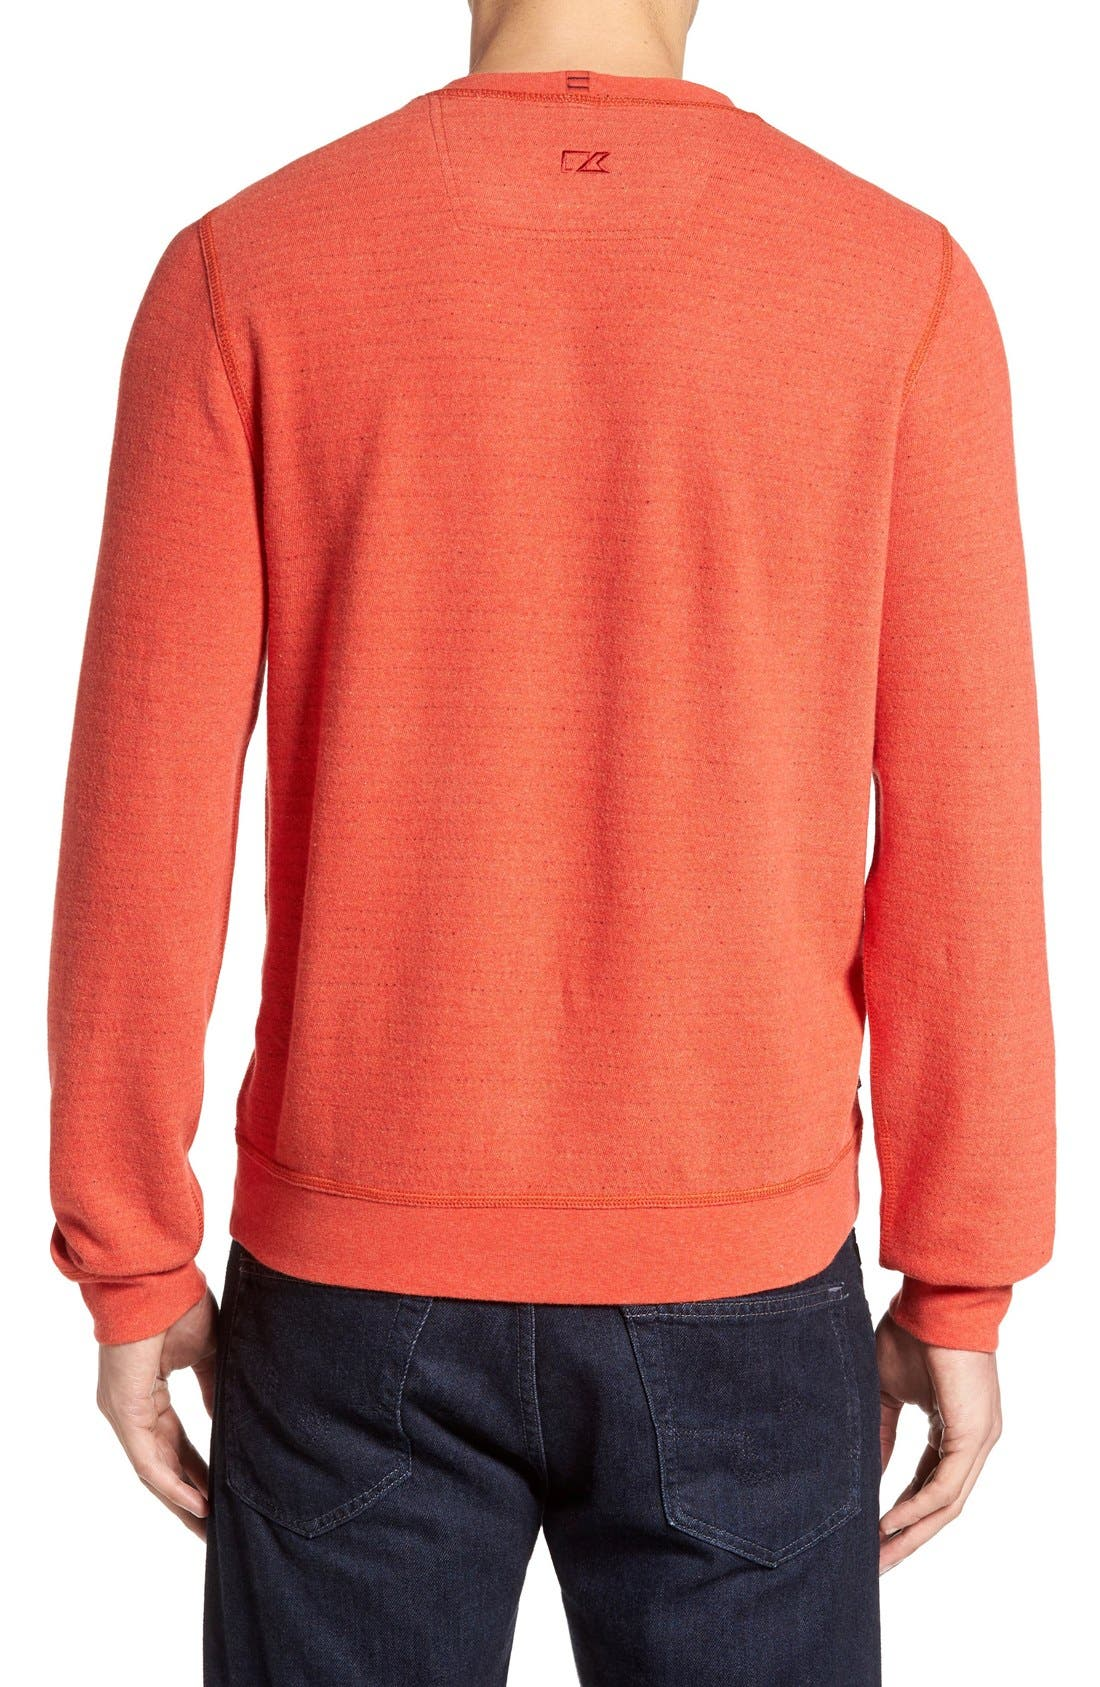 'Gleann' French Terry Crewneck Sweatshirt,                             Alternate thumbnail 4, color,